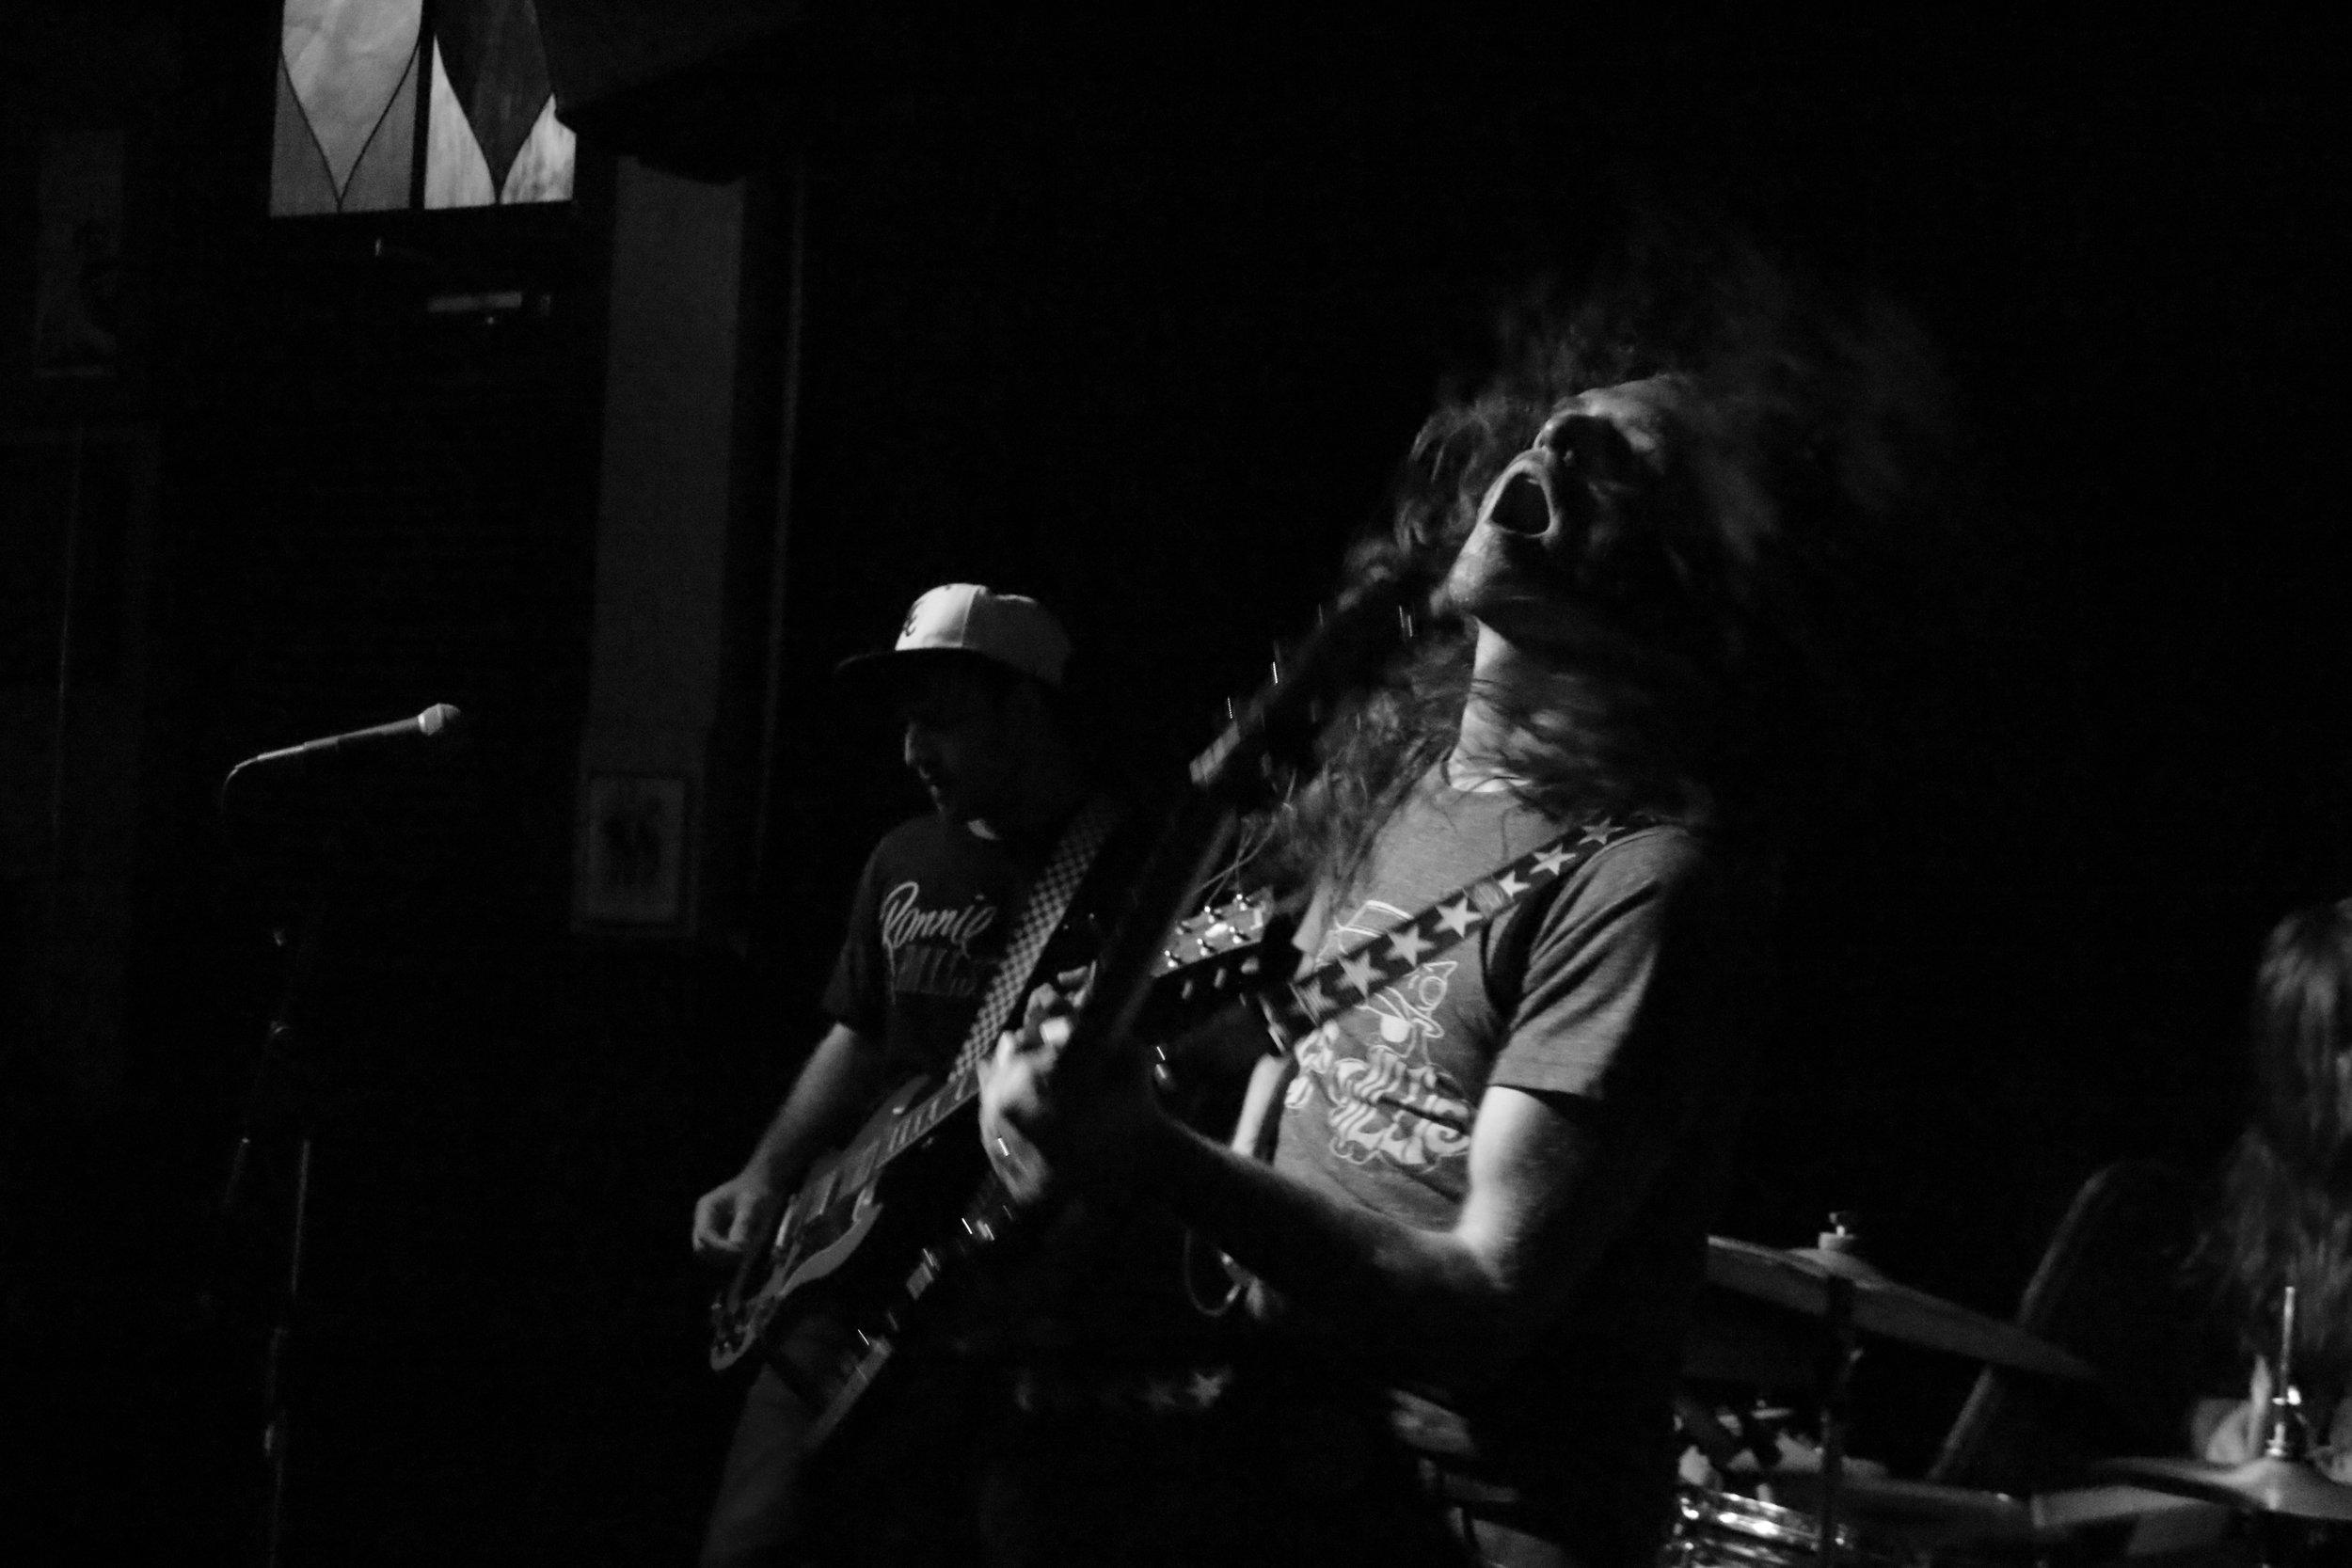 Lee Bains III & the Glory Fires. MOTR Pub, Cincinnati, OH. 2014.